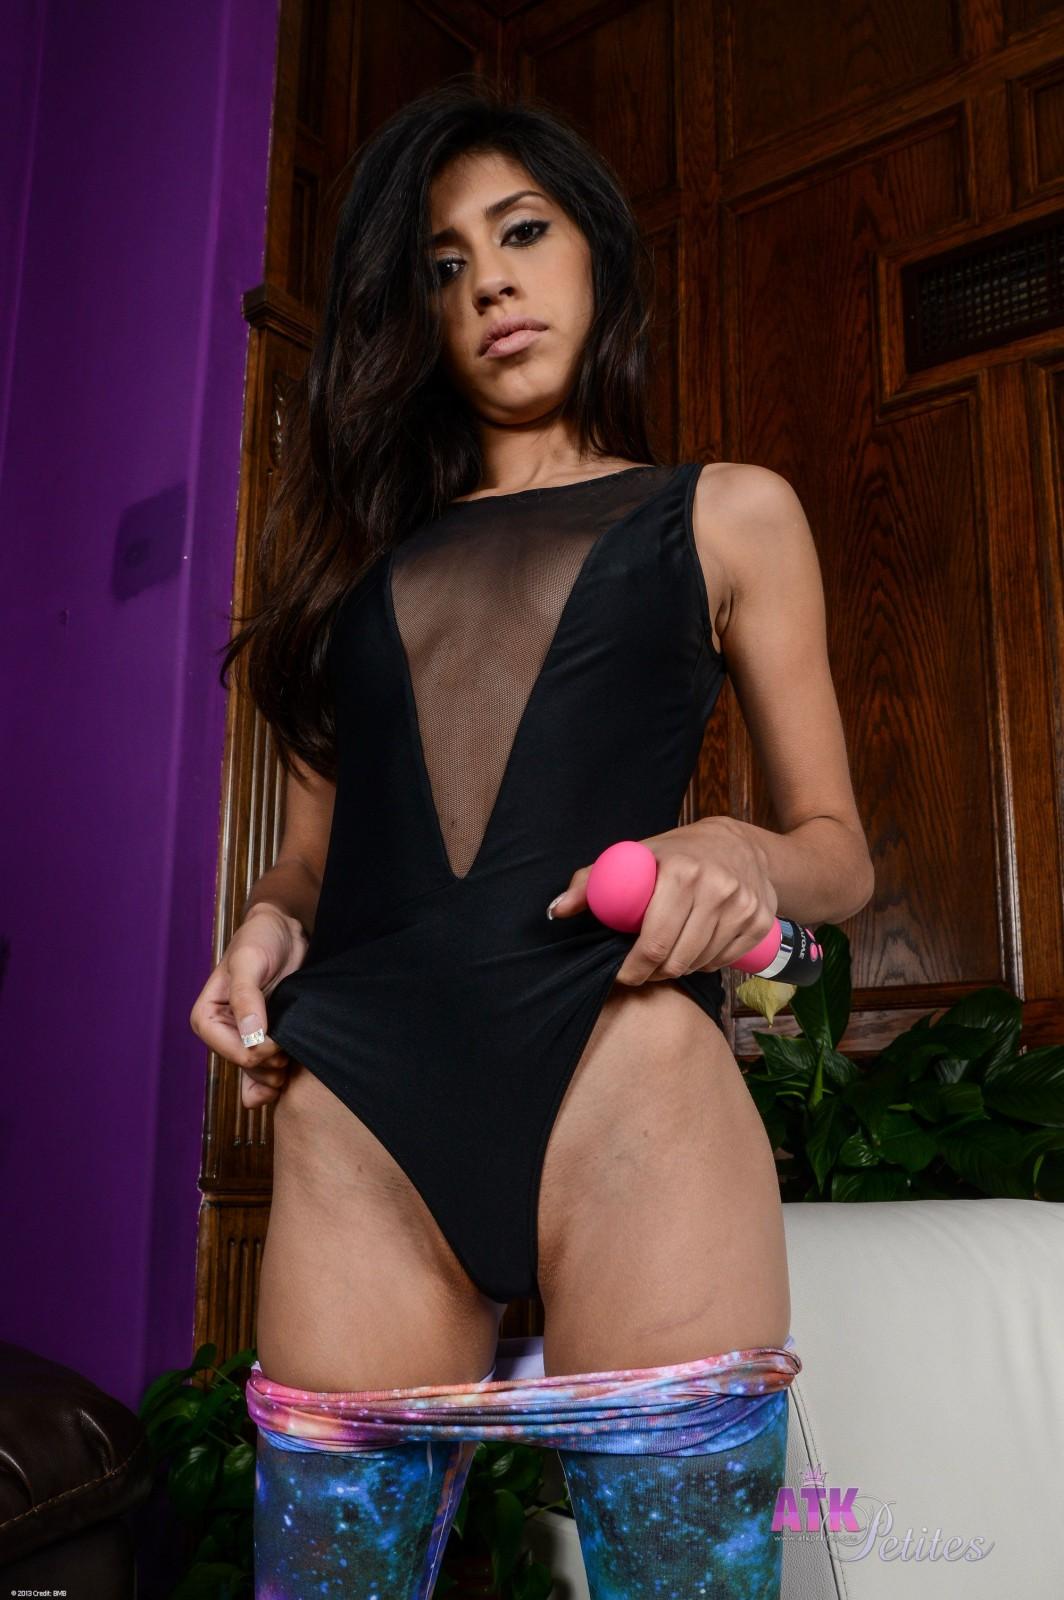 Slutty latina angel del rey gets throat and ass slammed hard 6